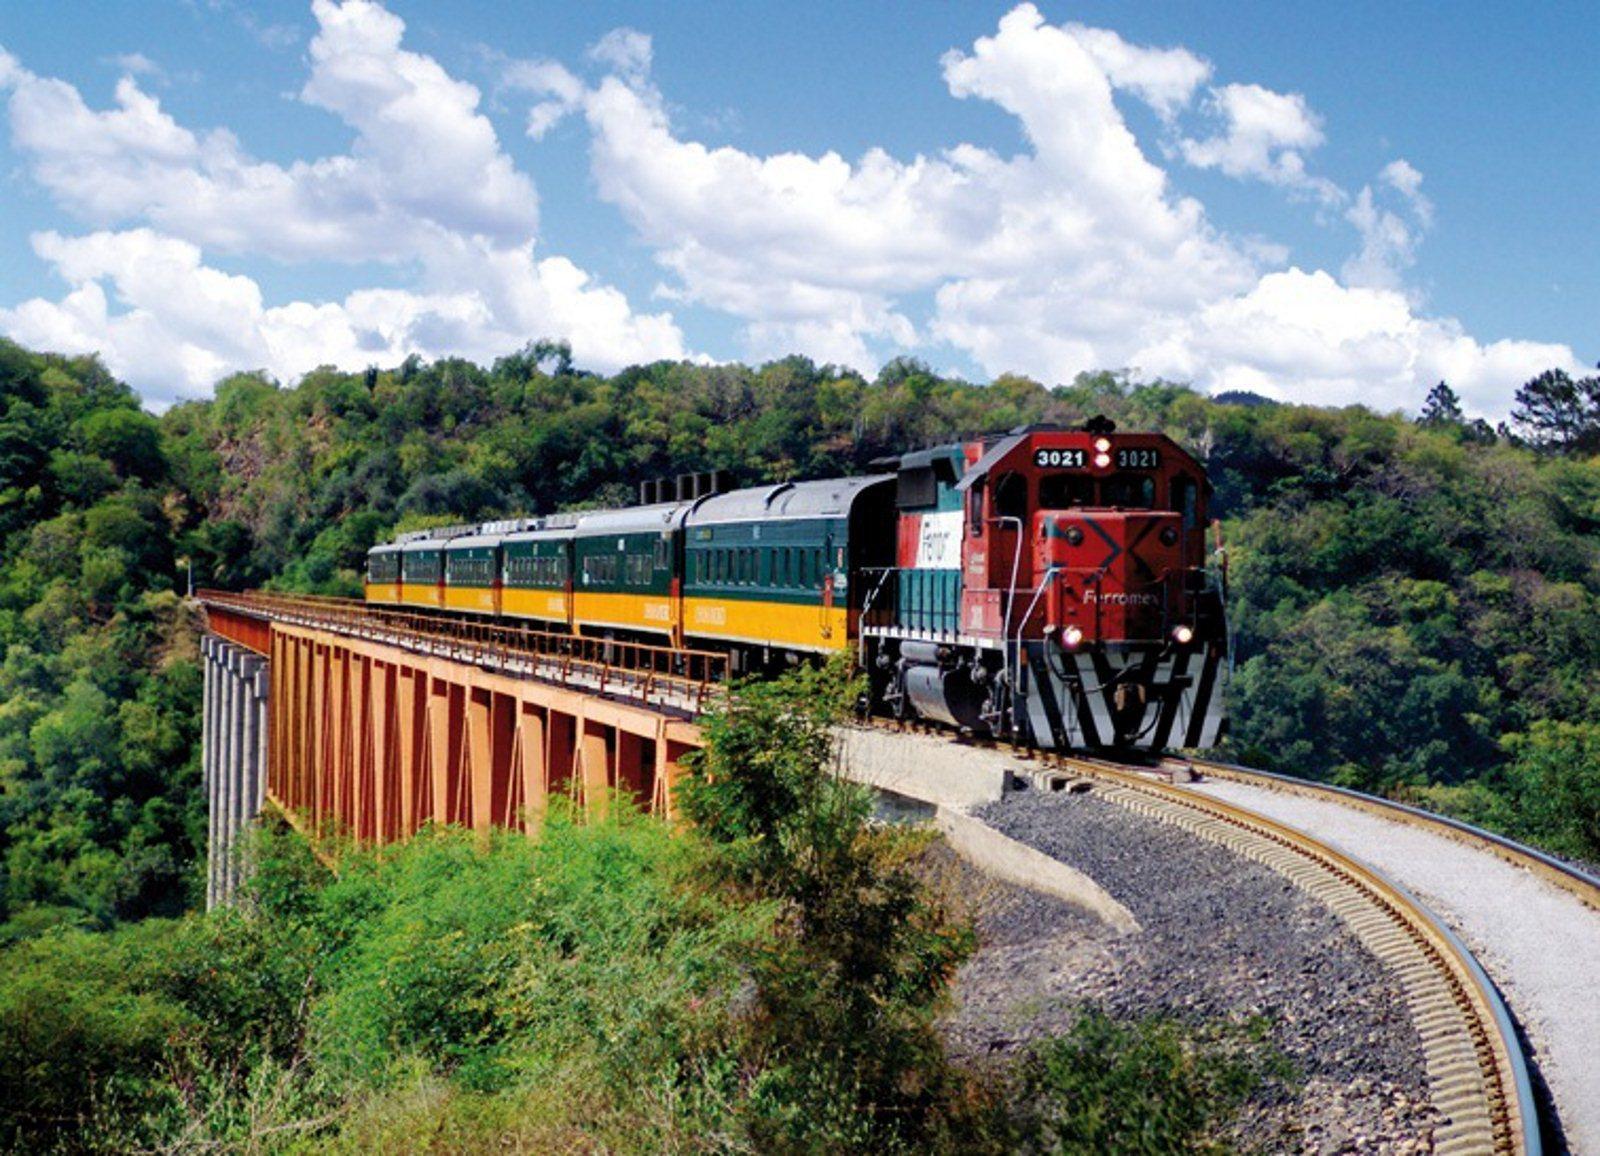 Tren de carga pasando por unos rieles  Descripción generada automáticamente